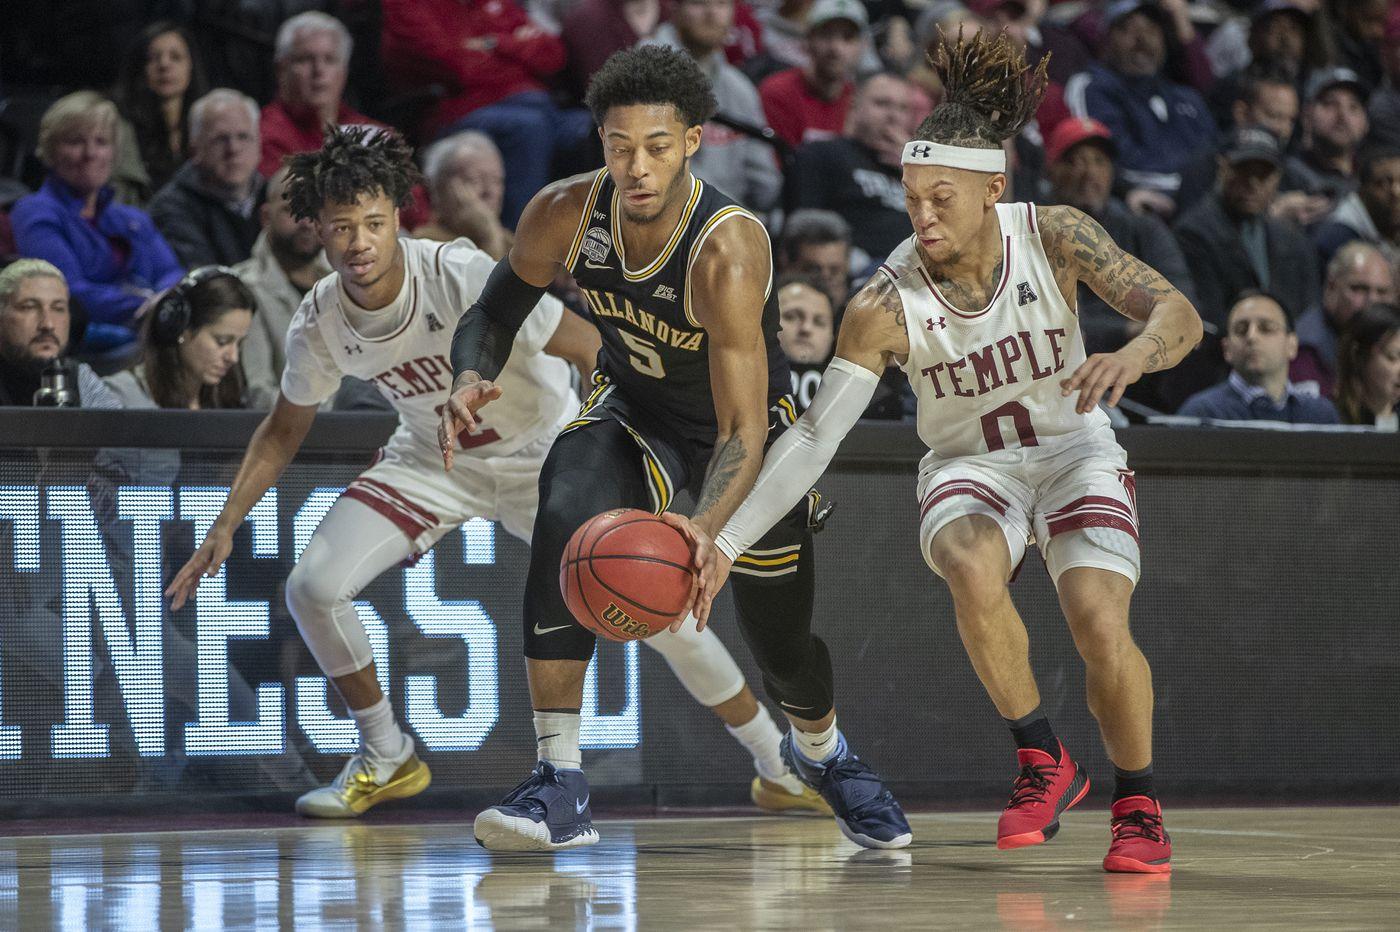 Rhode Island replaces No. 2 Baylor, joins No. 3 Villanova, Boston College,, and Arizona State at Connecticut tournament